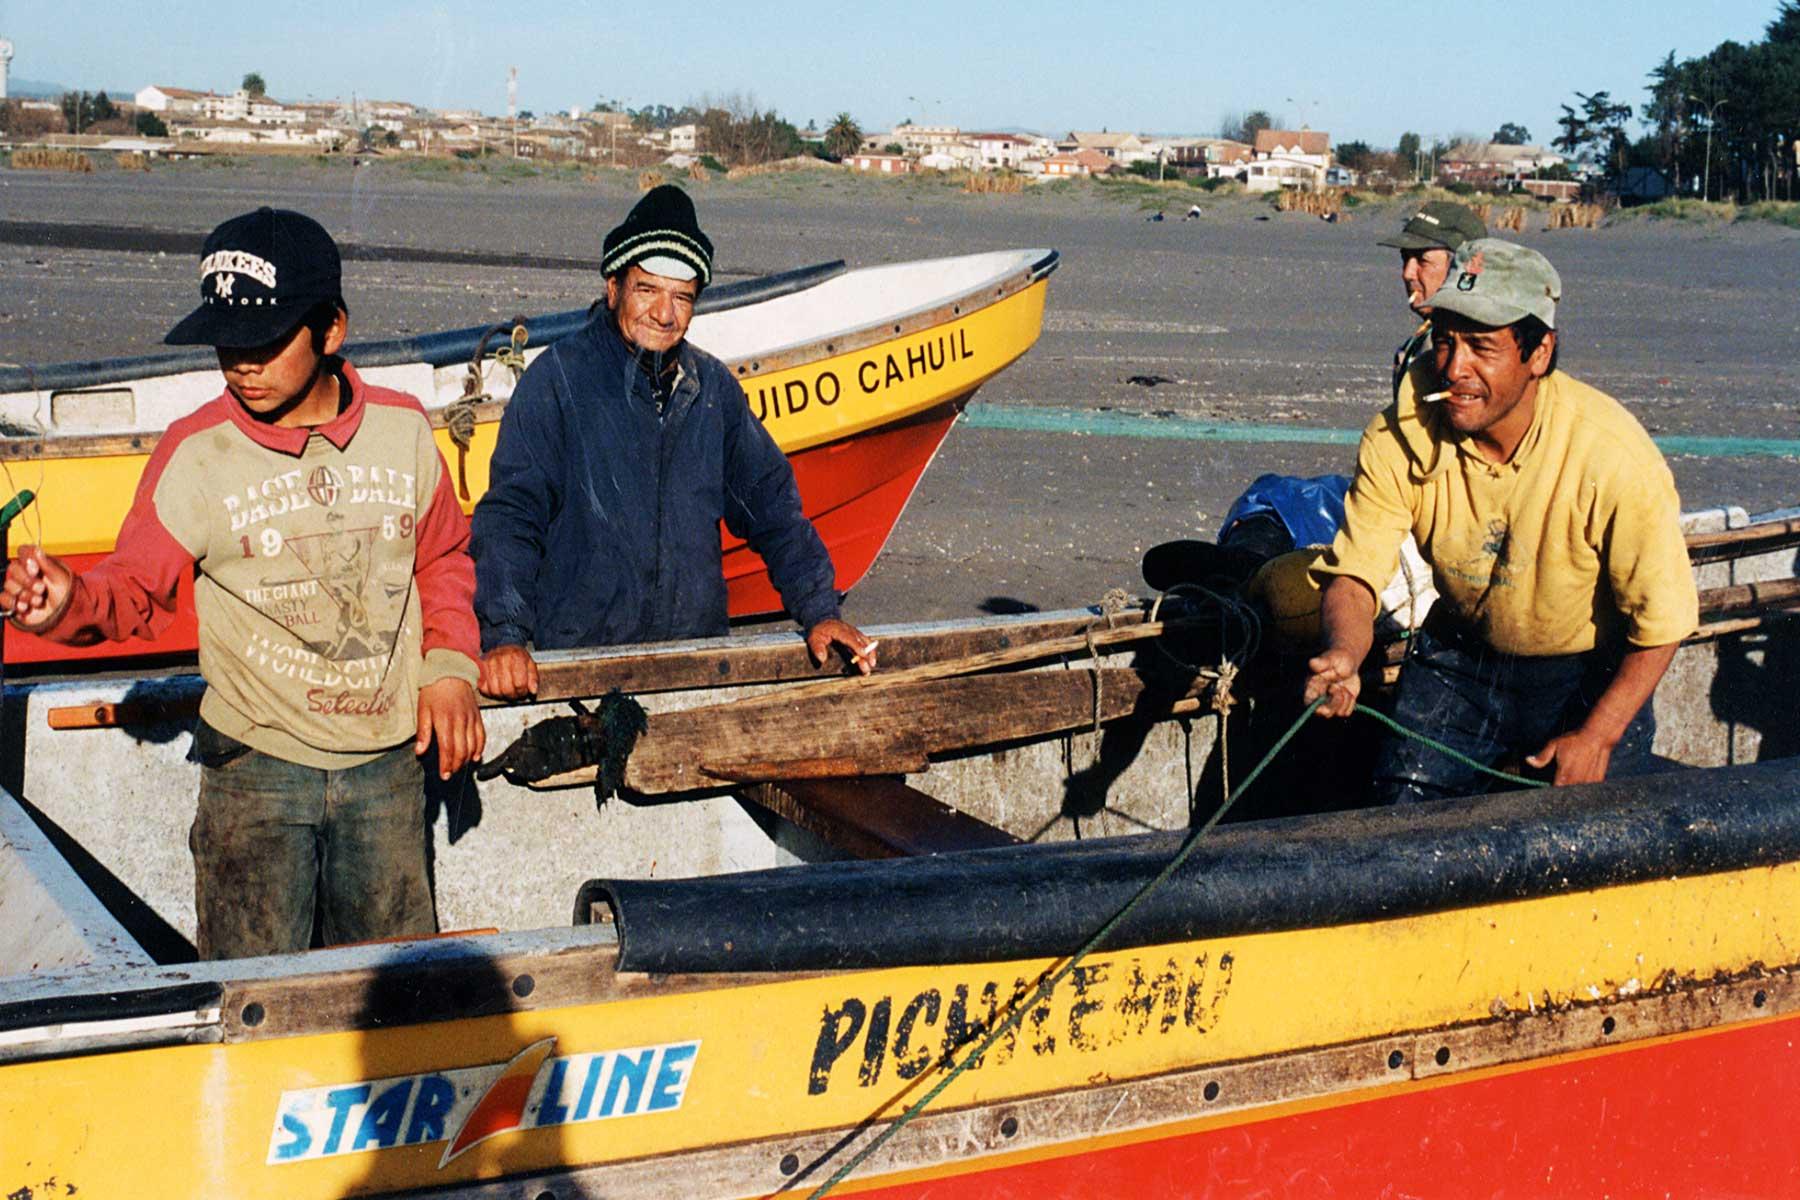 Fishers at Pichilemu   Chile   Steven Andrew Martin   Travel Journal   Dr Steven Martin